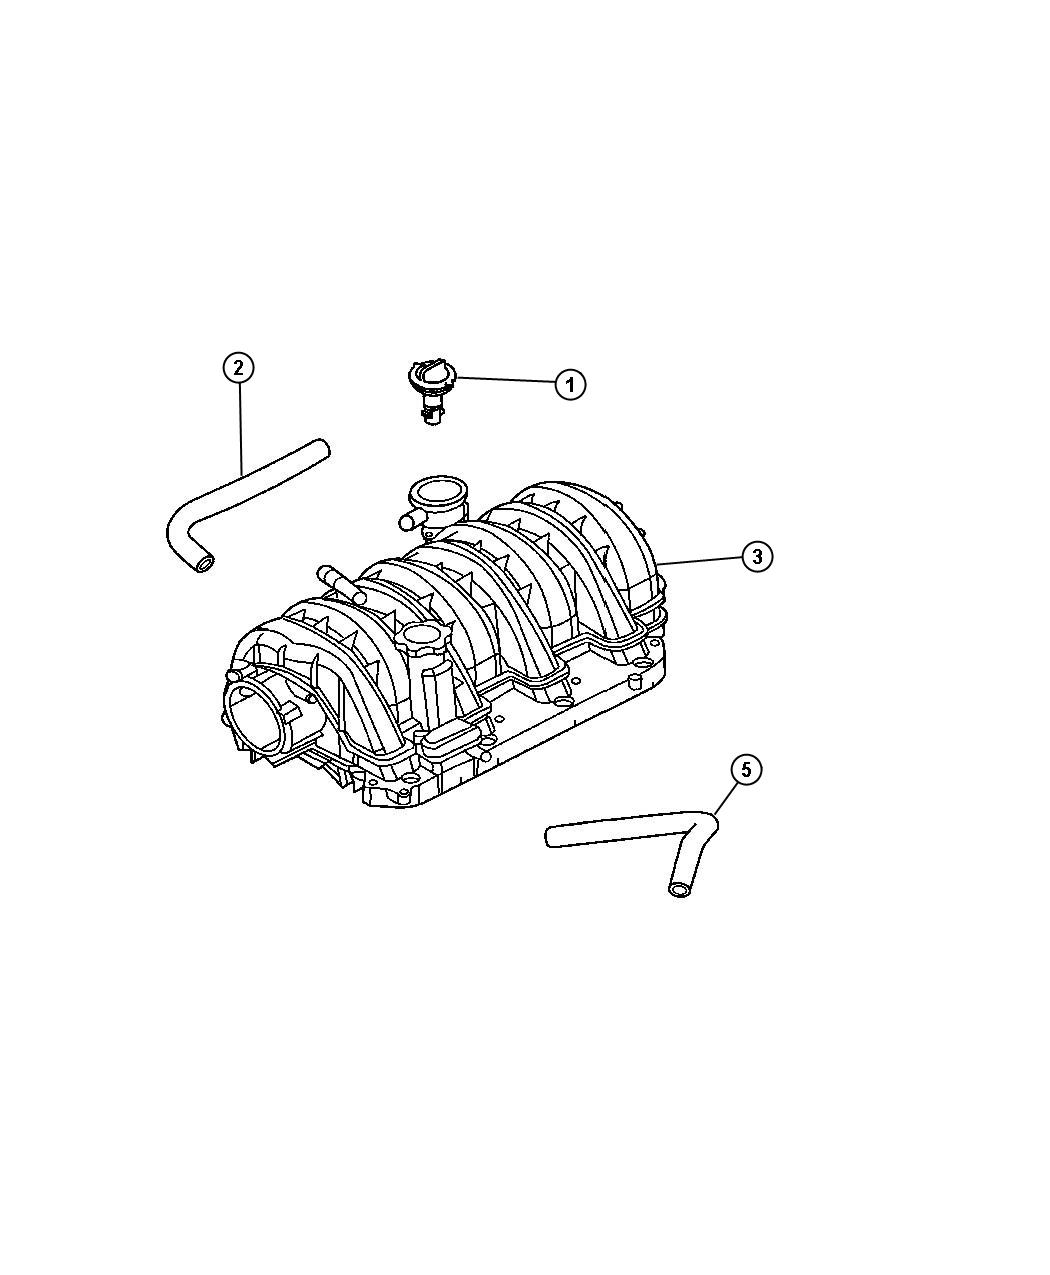 2005 Chrysler 300 Hose. Cylinder head to intake manifold